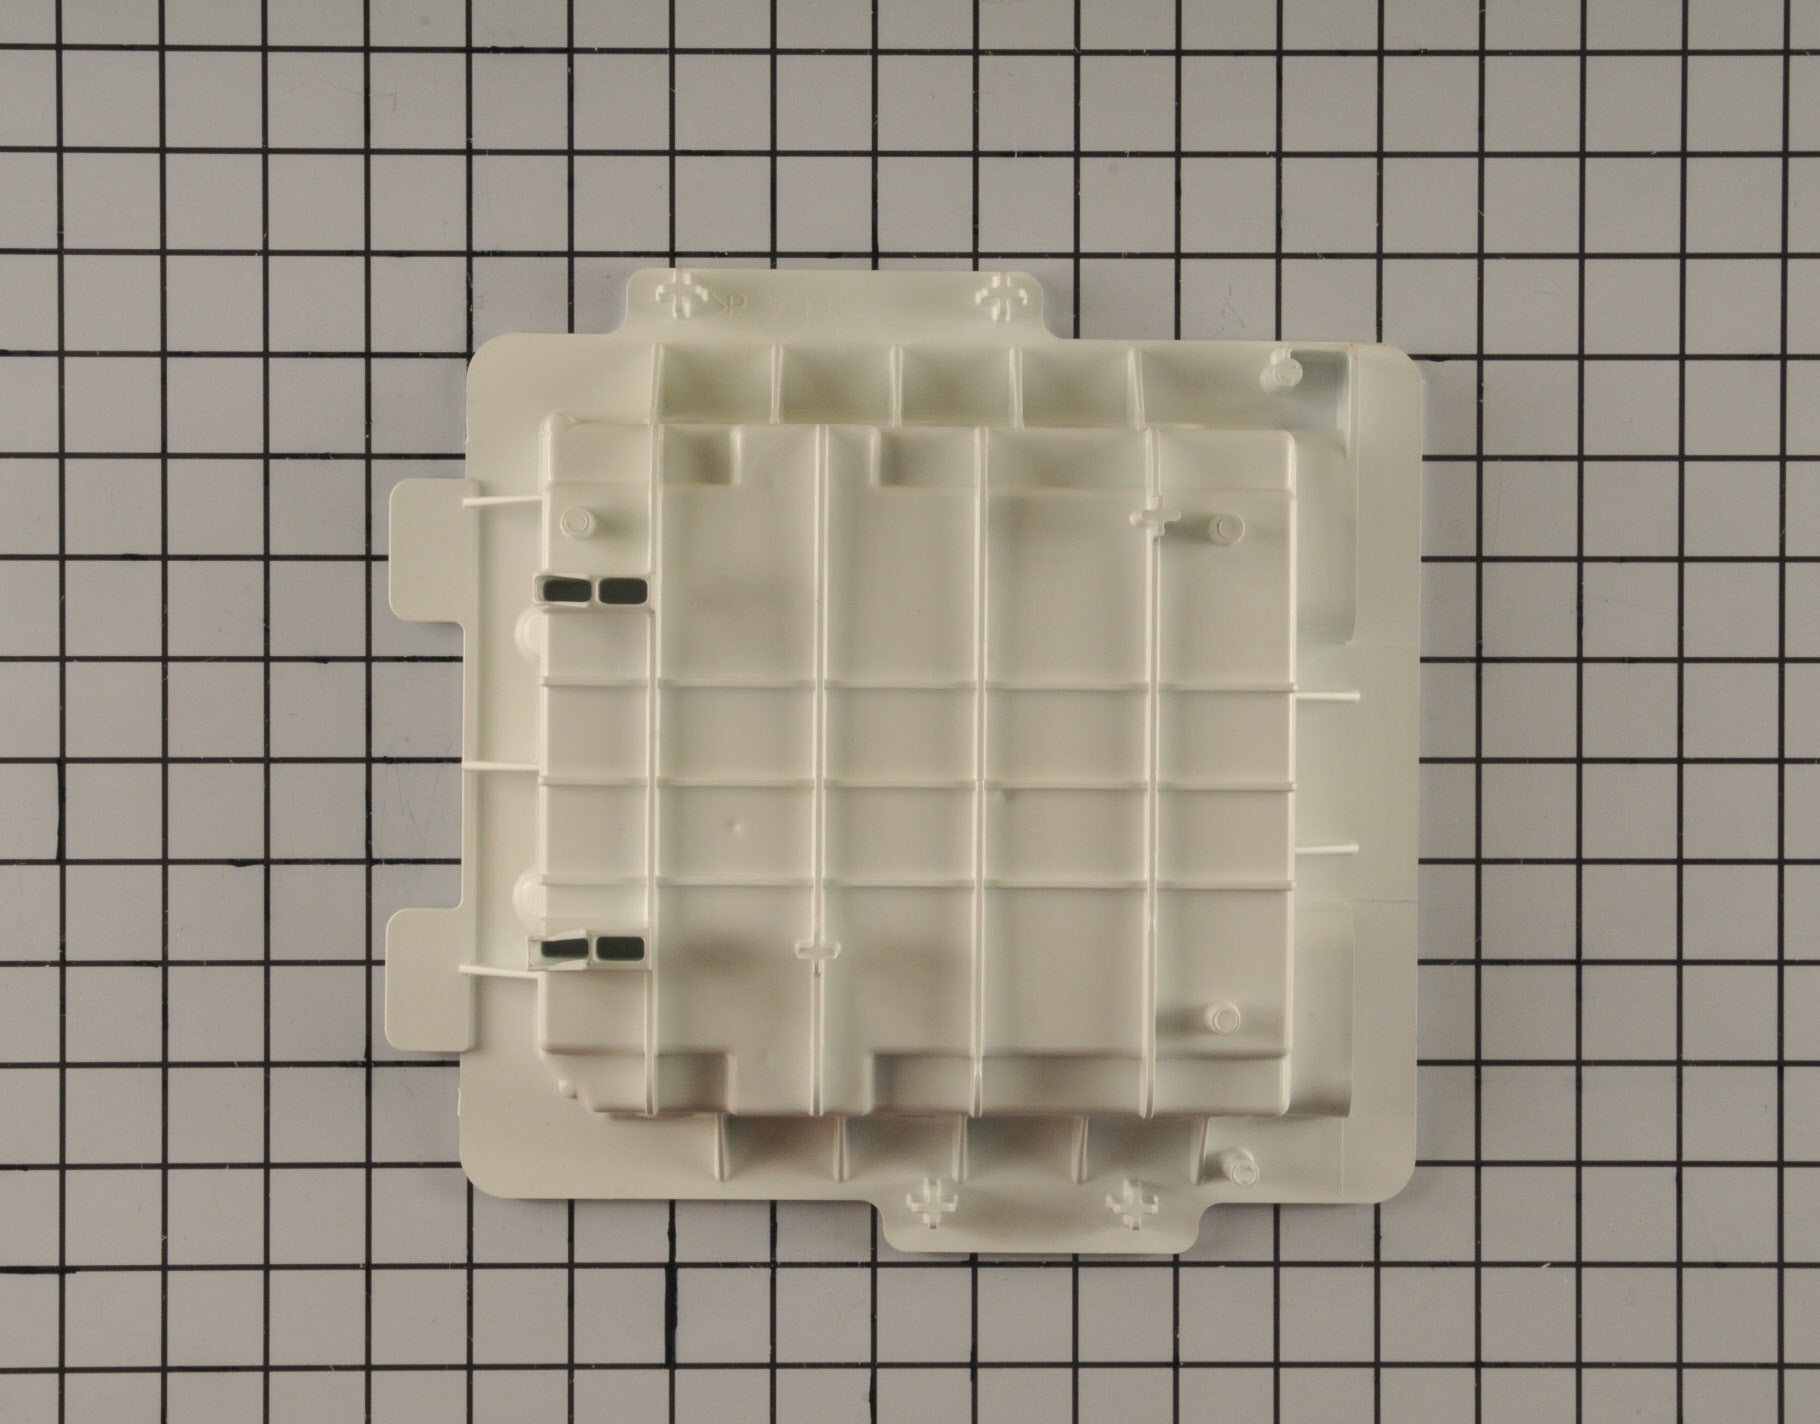 WP67006390 KitchenAid Refrigerator Part -Control Cover